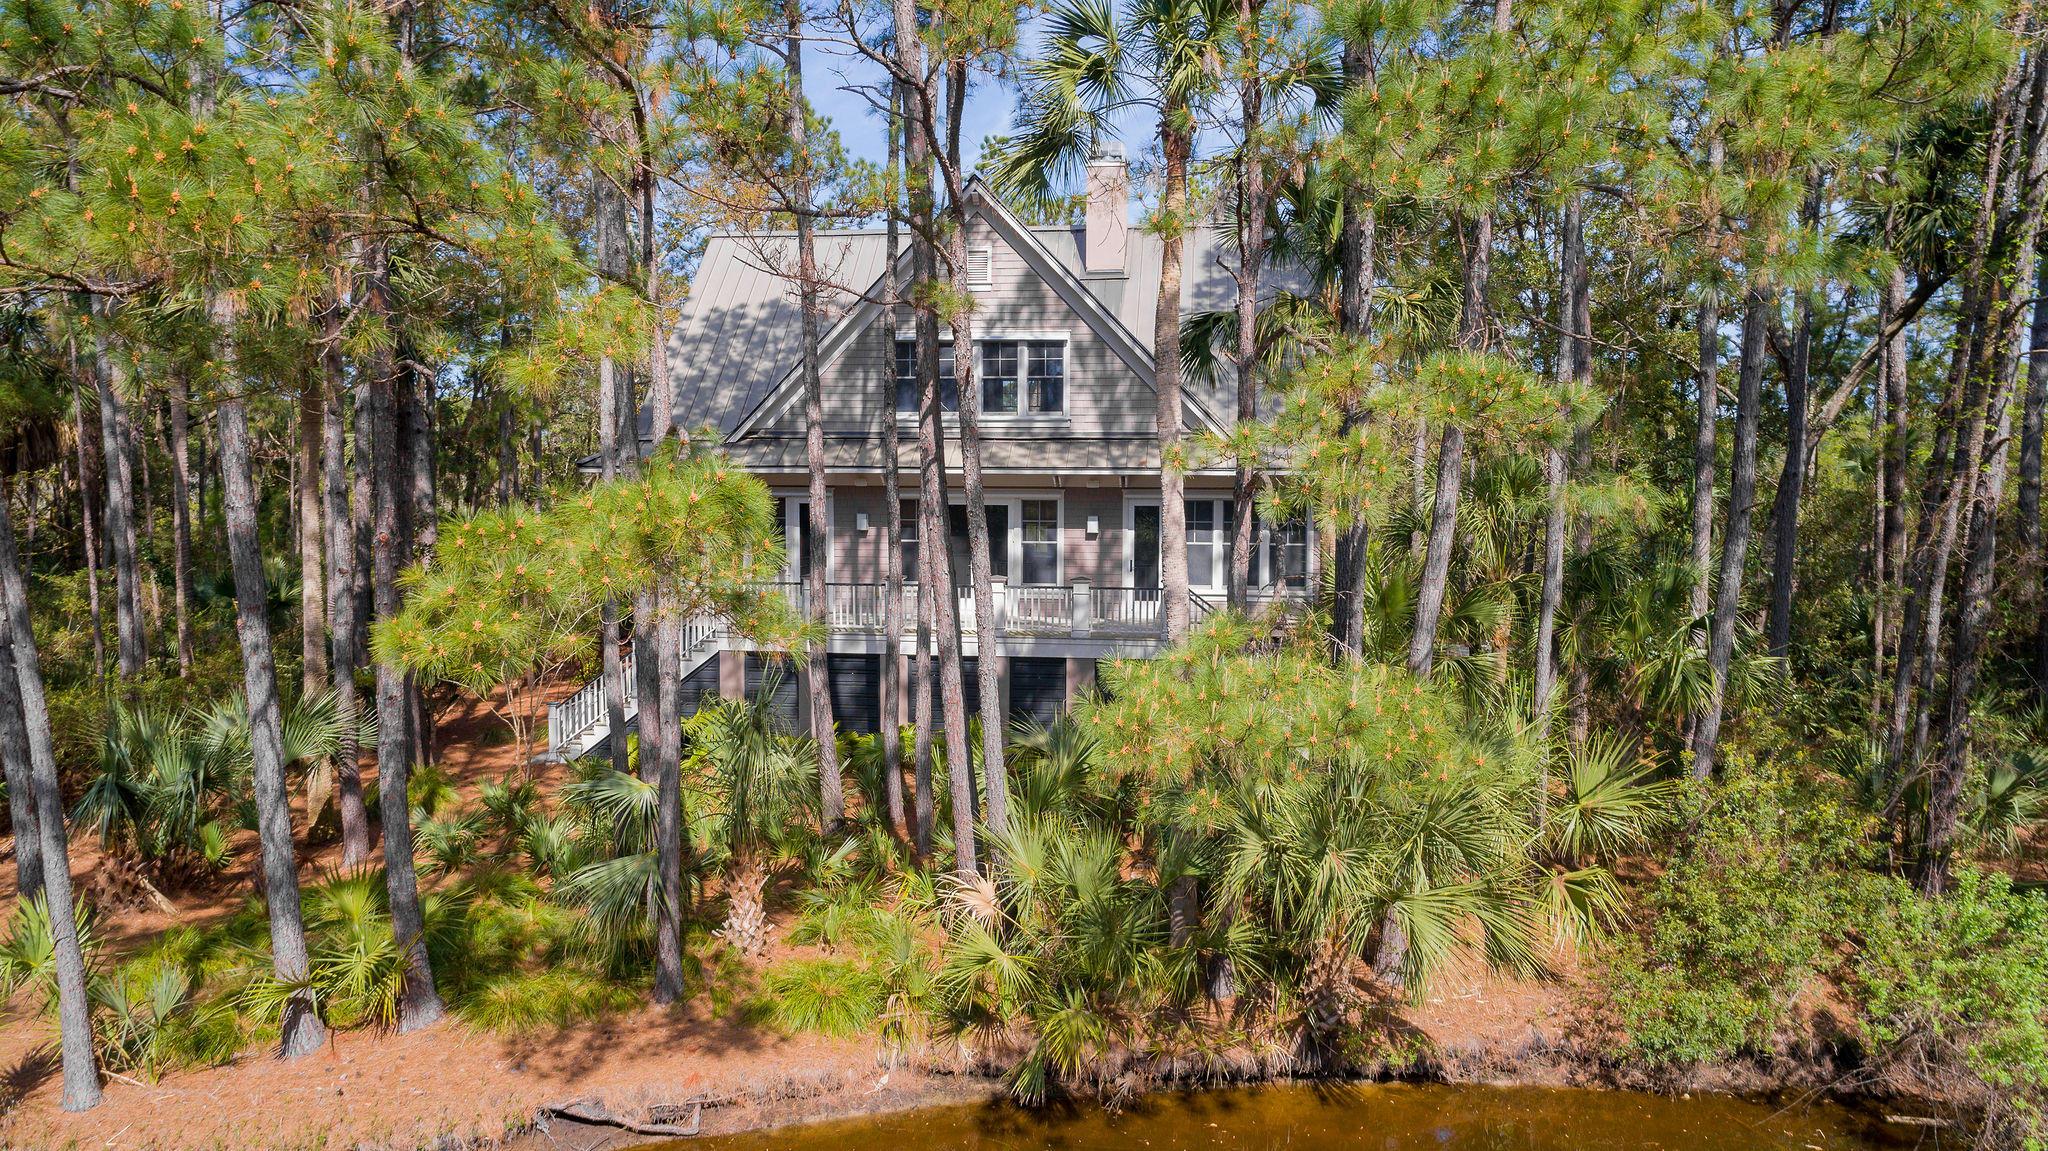 Kiawah Island Homes For Sale - 3 Grey Widgeon, Kiawah Island, SC - 77